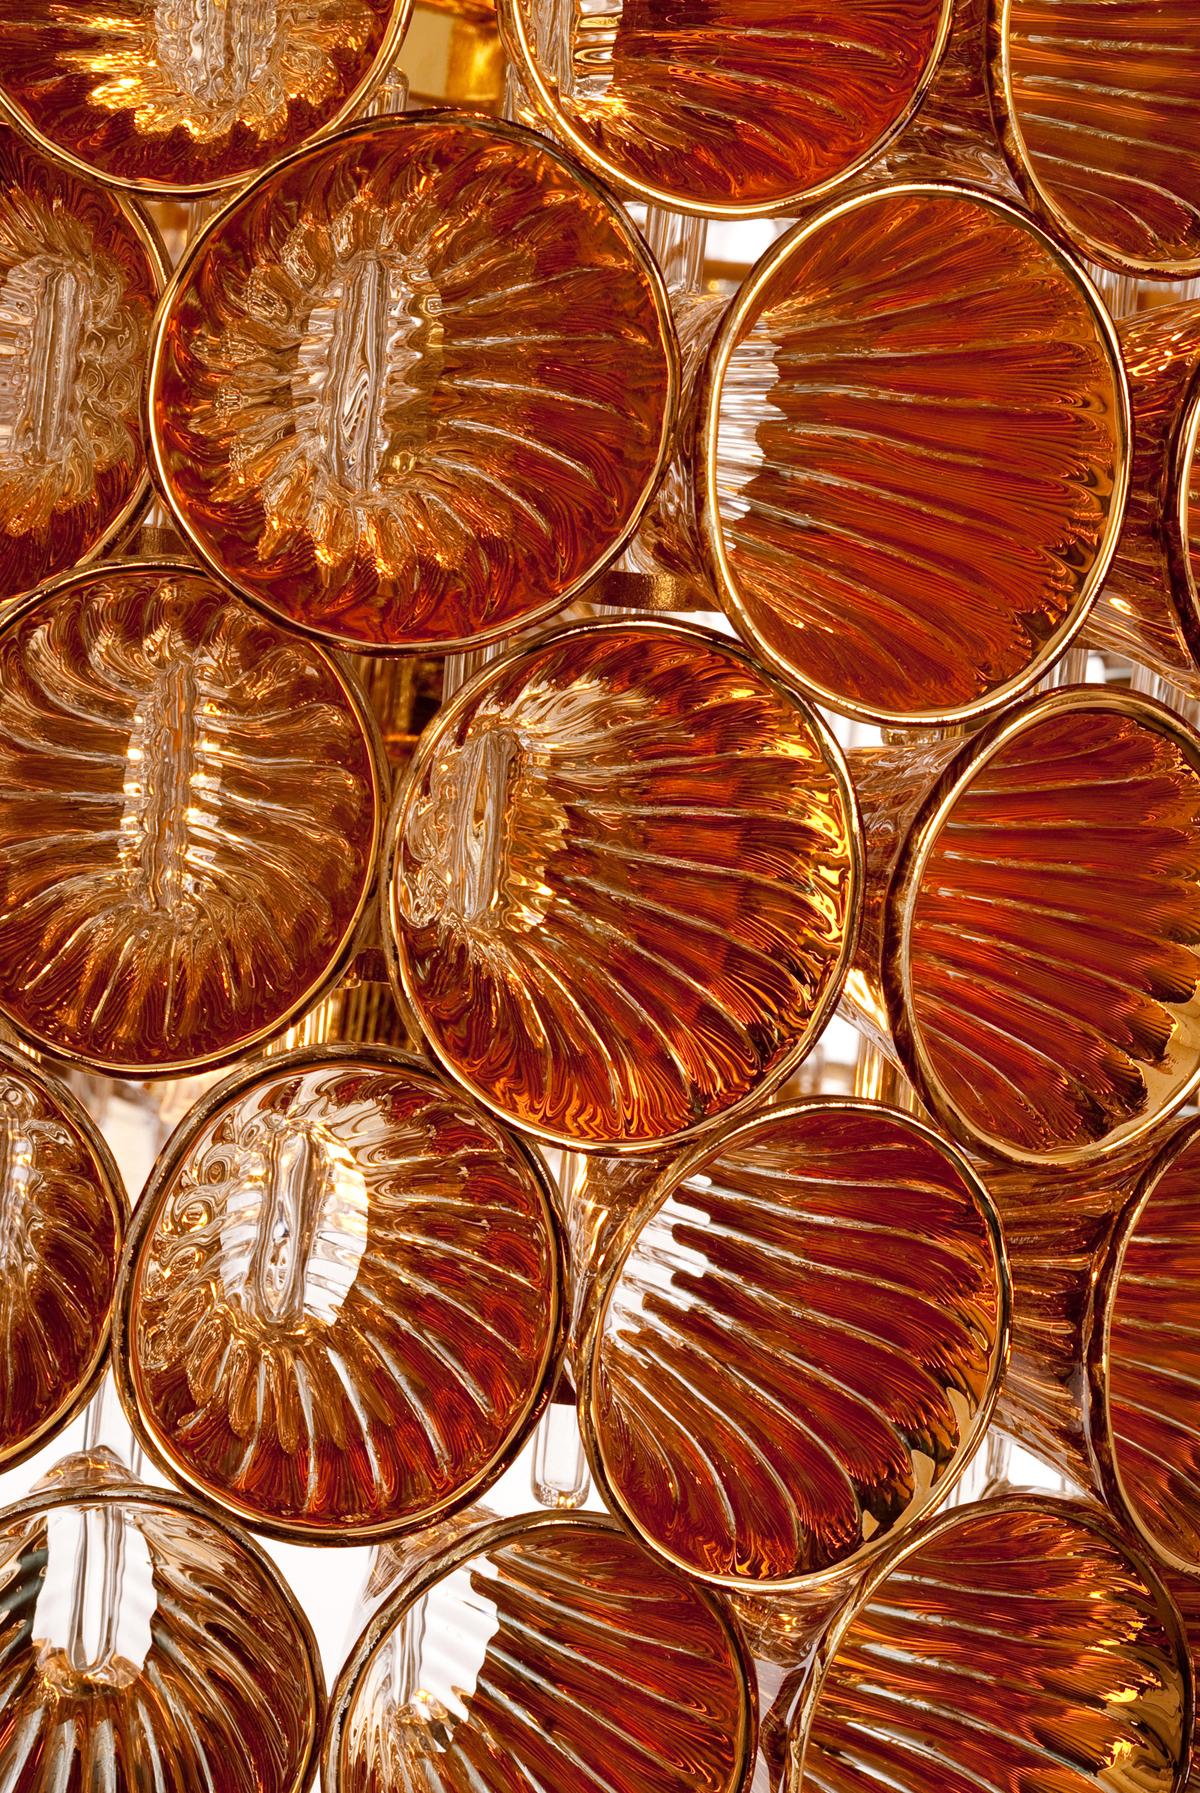 corail-suspension-gold-veronese-maurizio-galante-tal-lancman-2.jpg